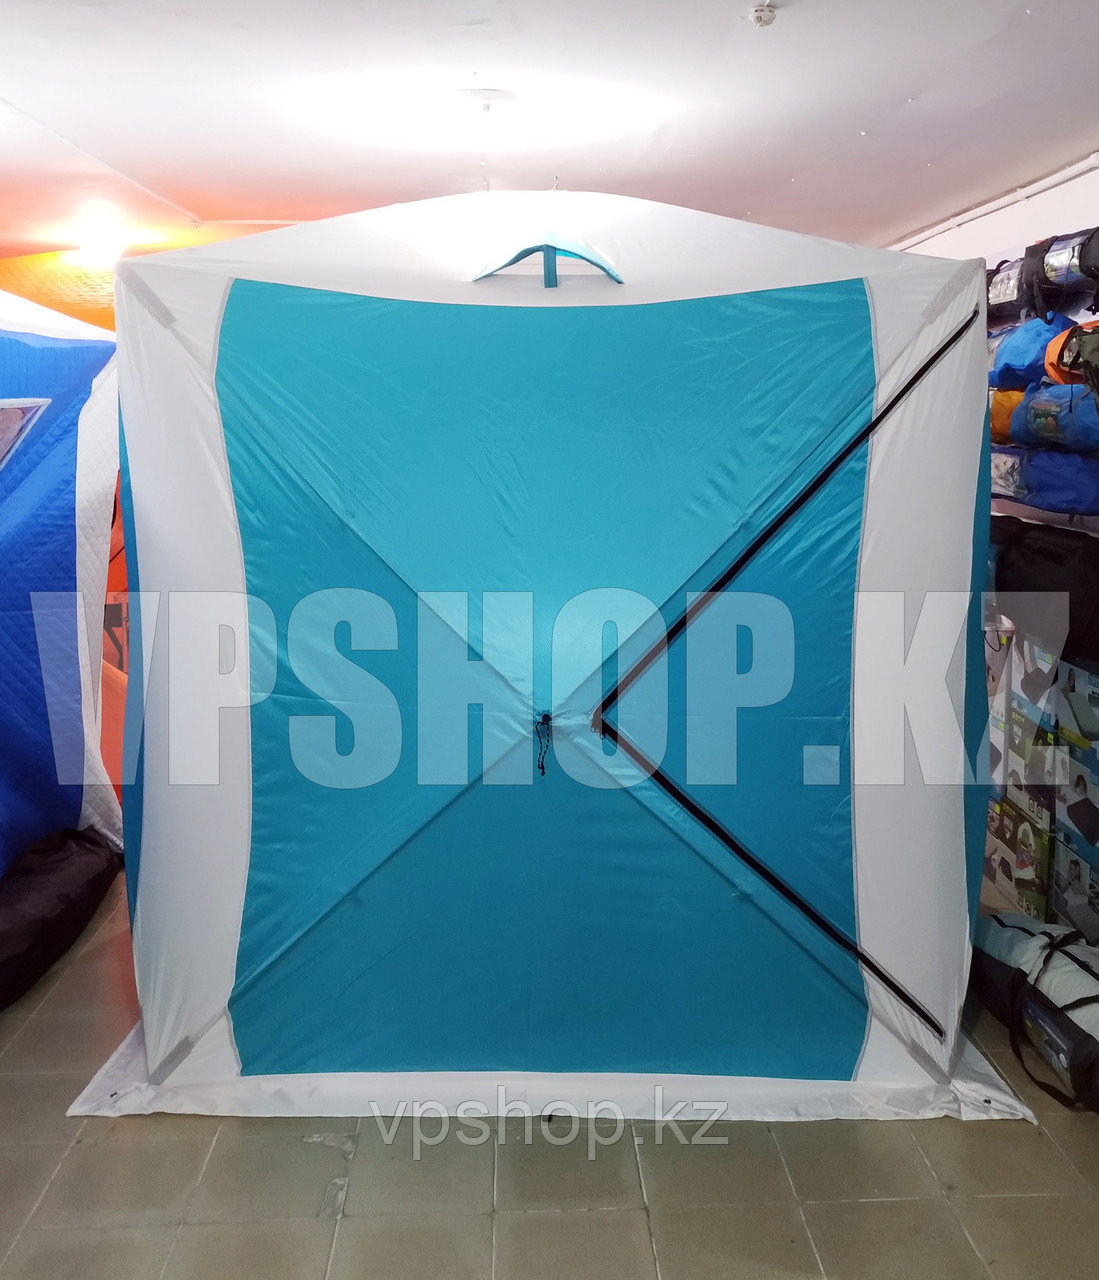 Утепленная палатка для рыбалки КУБ 200х200х215 см доставка